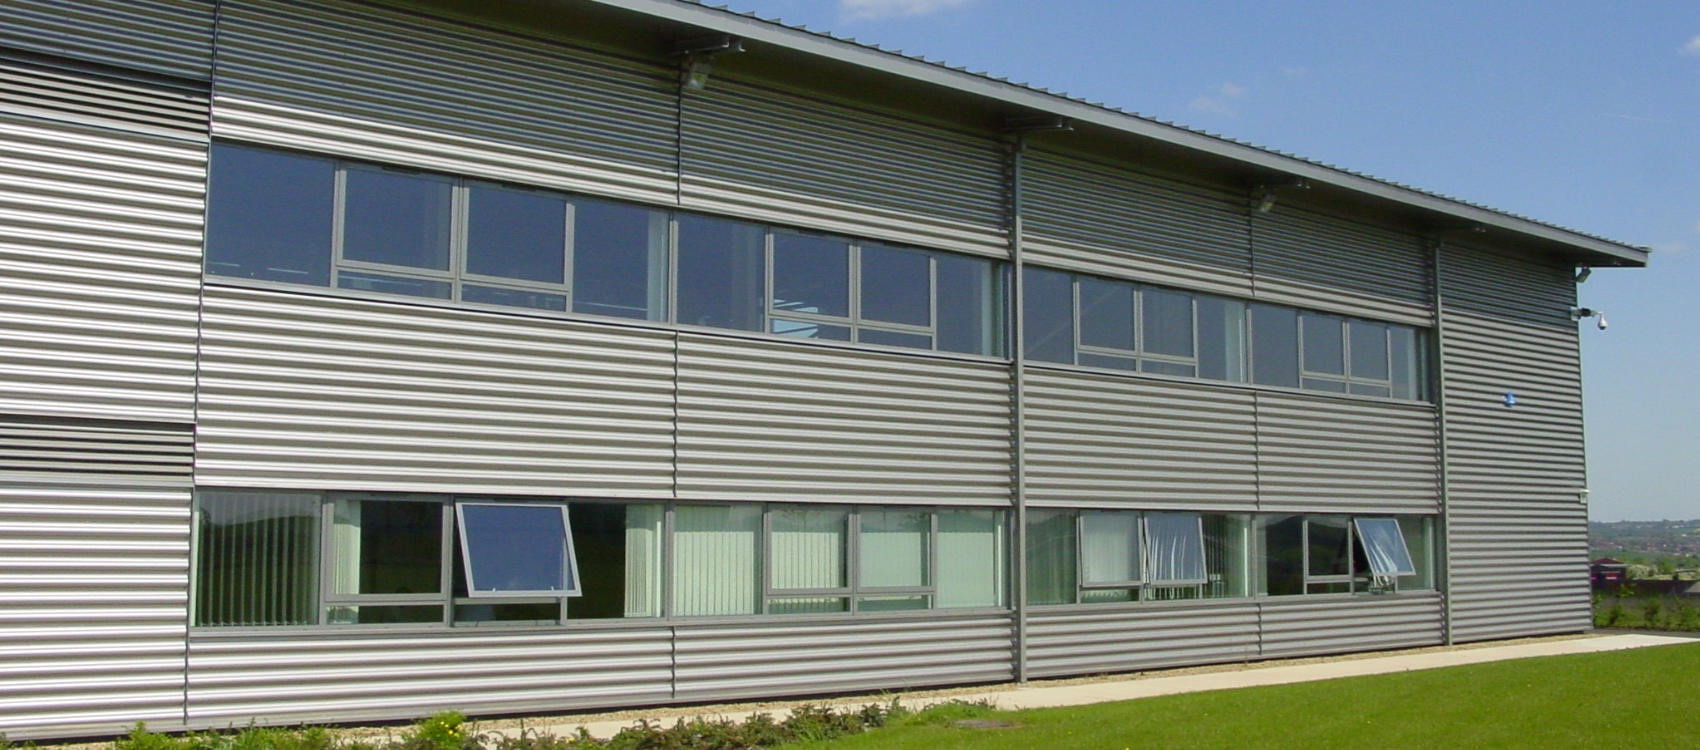 Architectural Profiles Half Round Sinusoidal Profiles